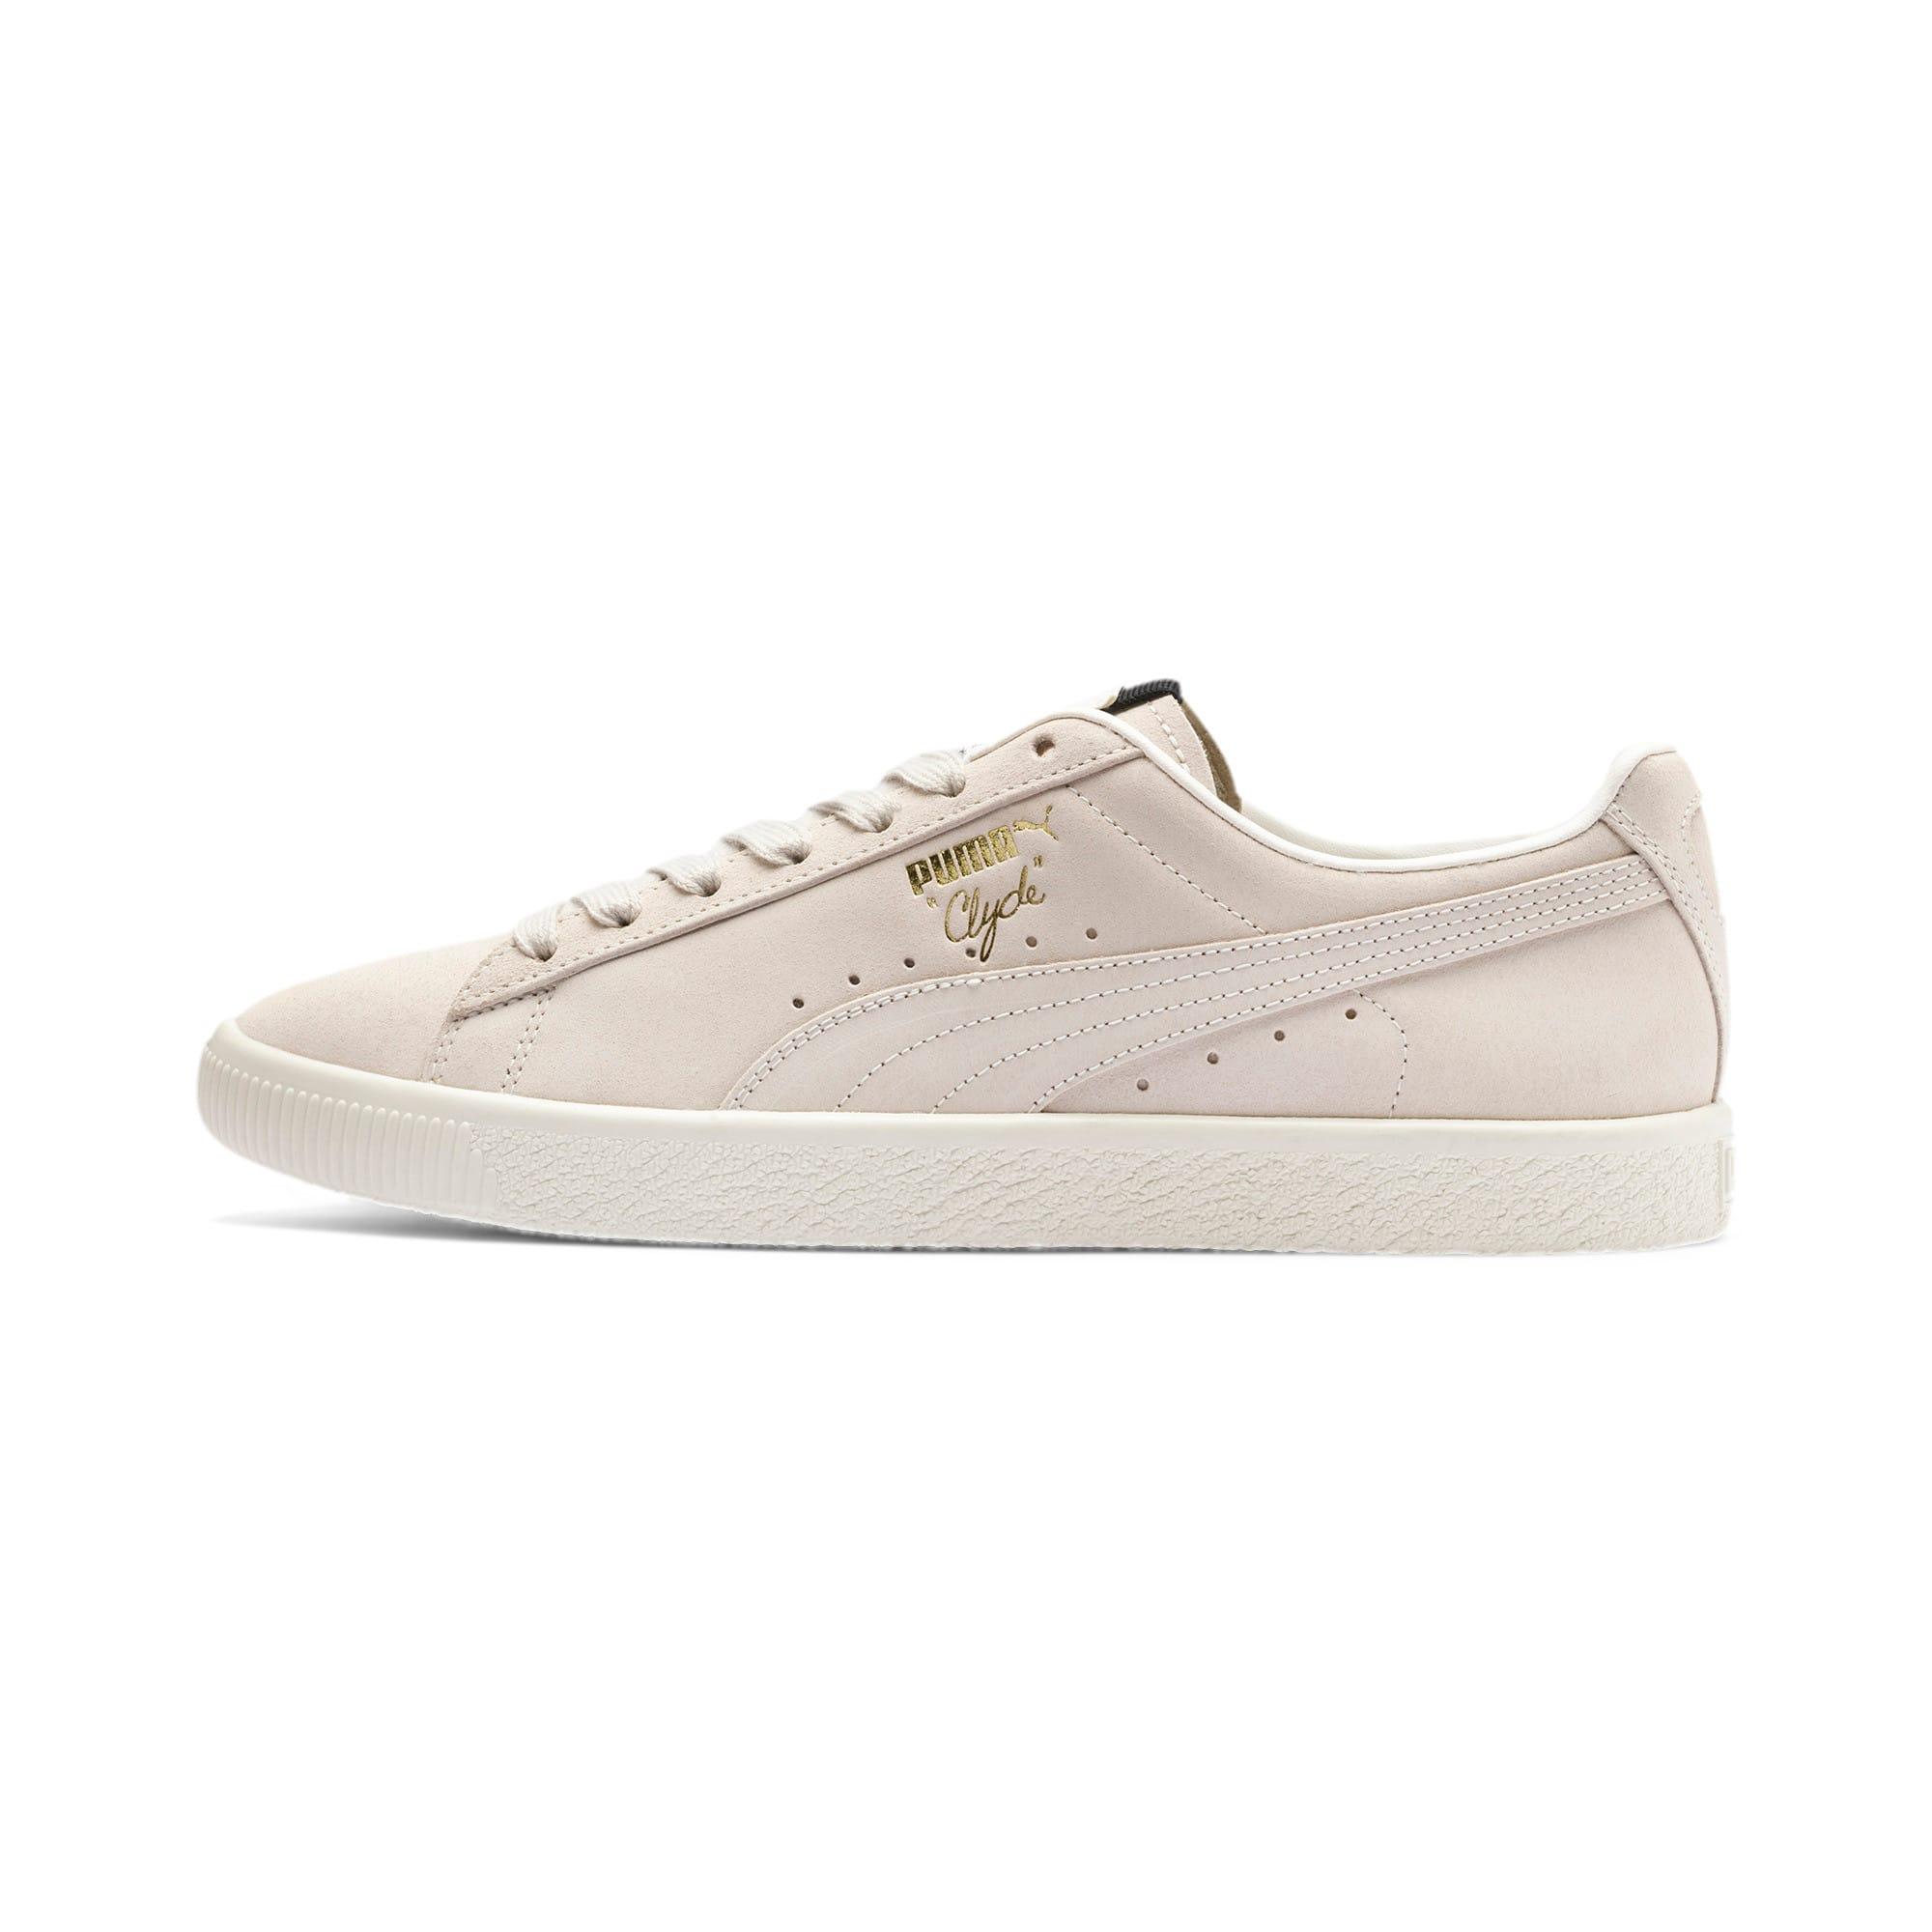 Thumbnail 1 of Clyde Fedora Sneakers, Whisper Wht-P Blk-WhisperWht, medium